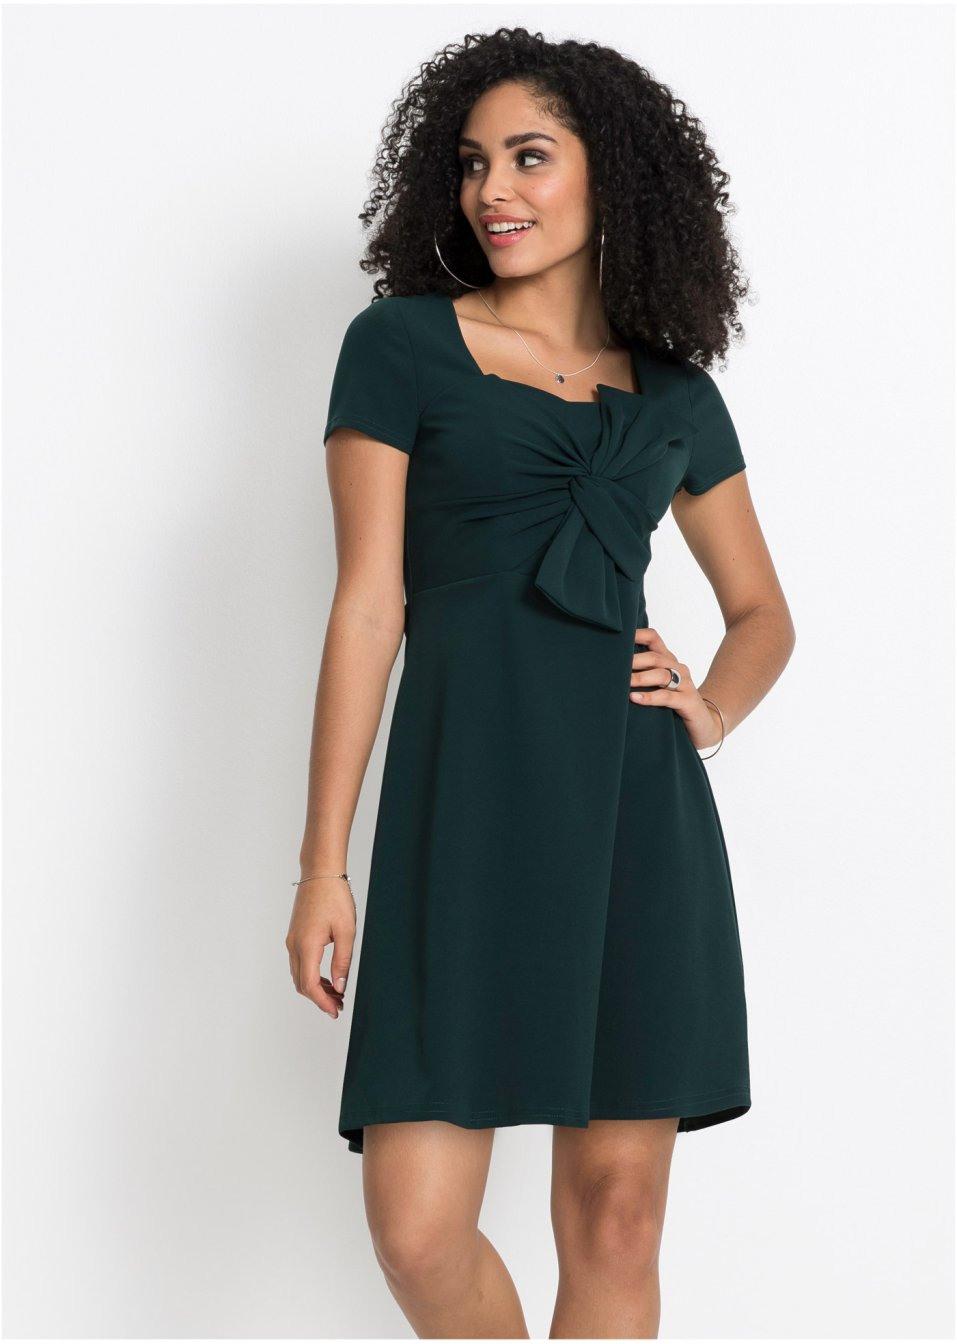 Kleid Mit Schleife Blaupetrol  Damen  Bonprixde